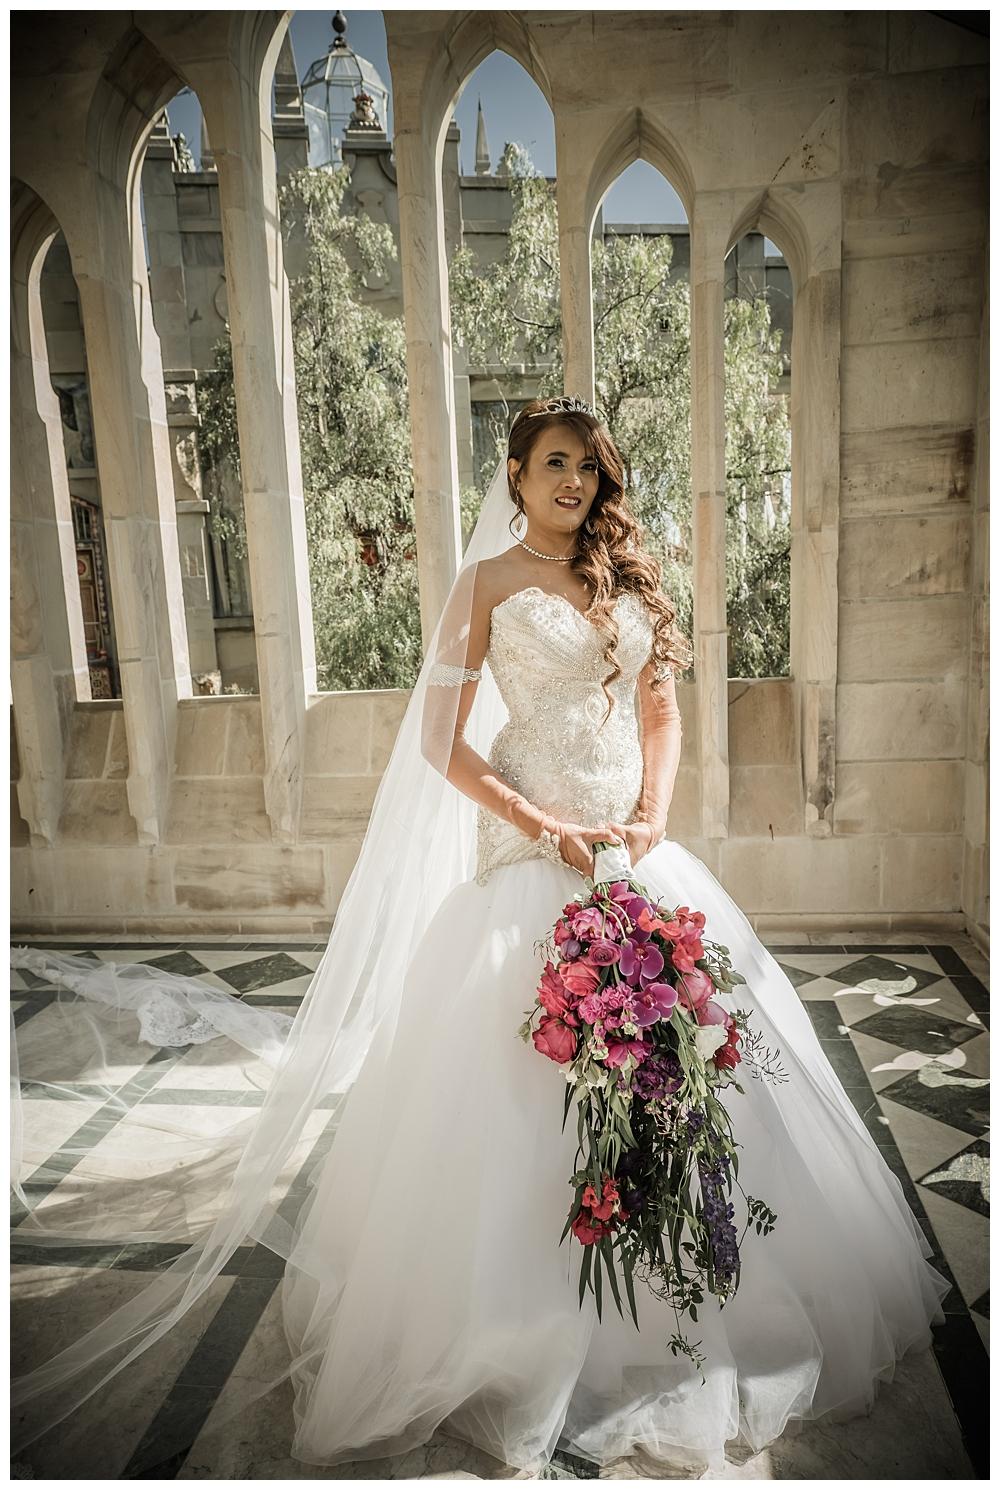 Best_Wedding_Photographer_AlexanderSmith_1863.jpg